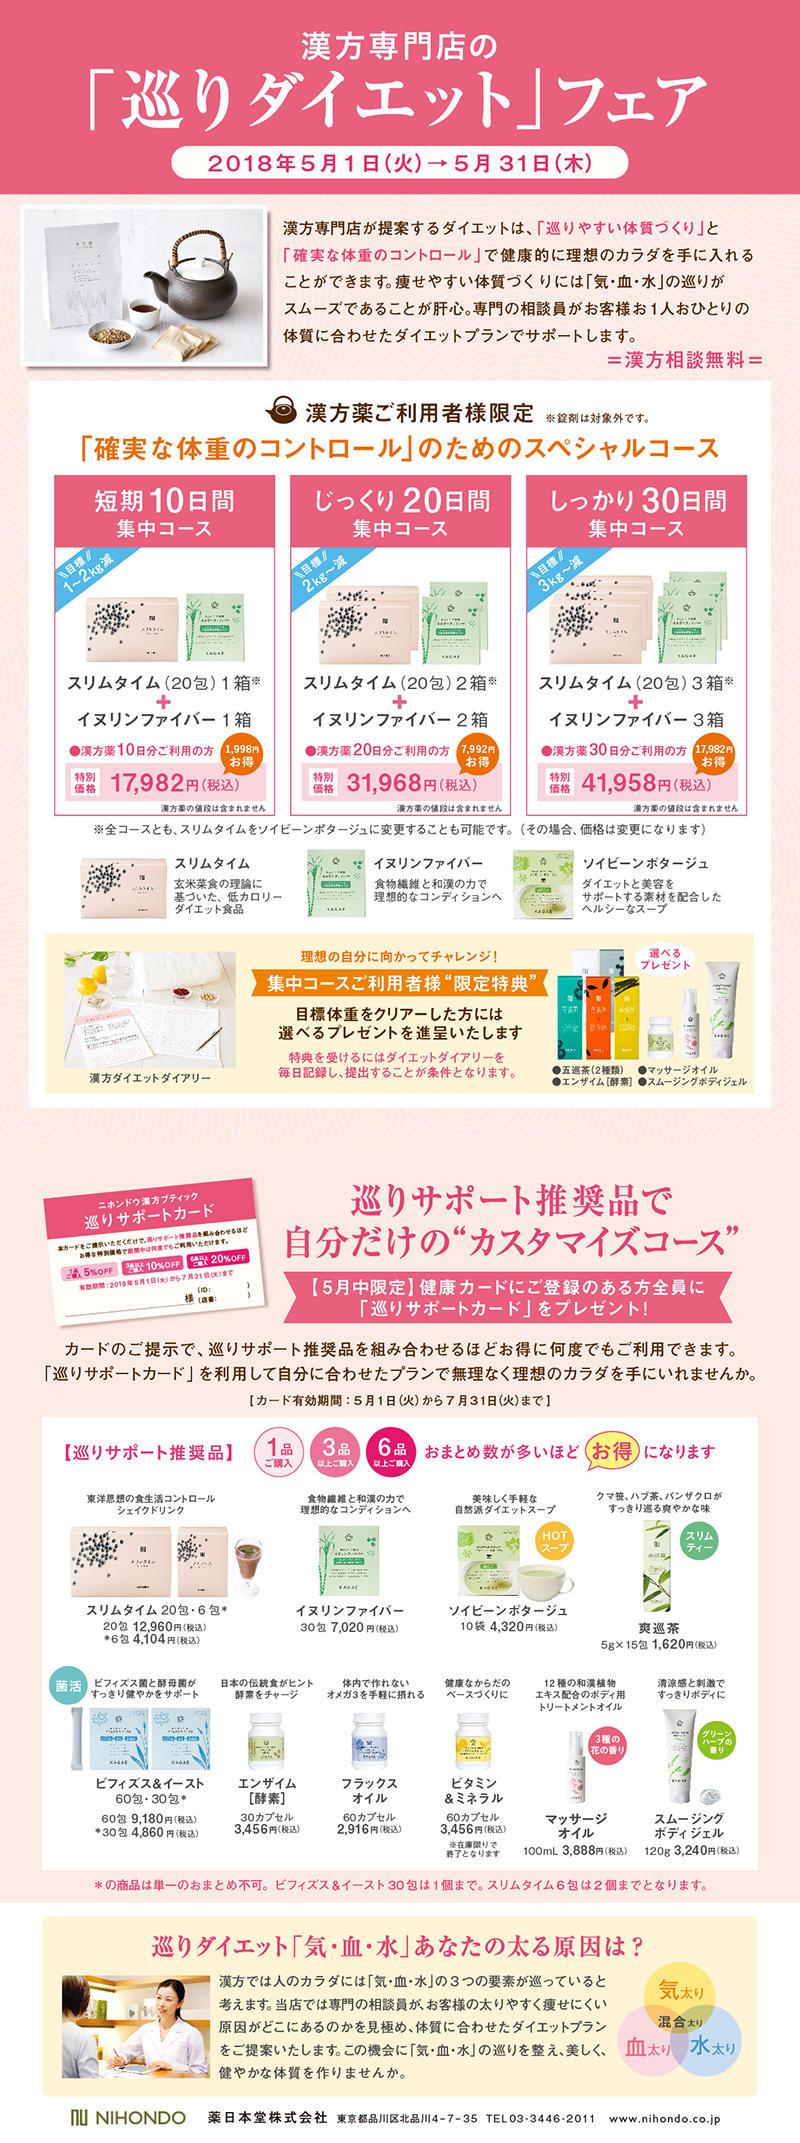 https://www.odori-bisse.com/info/nihondo_180507_img.jpg